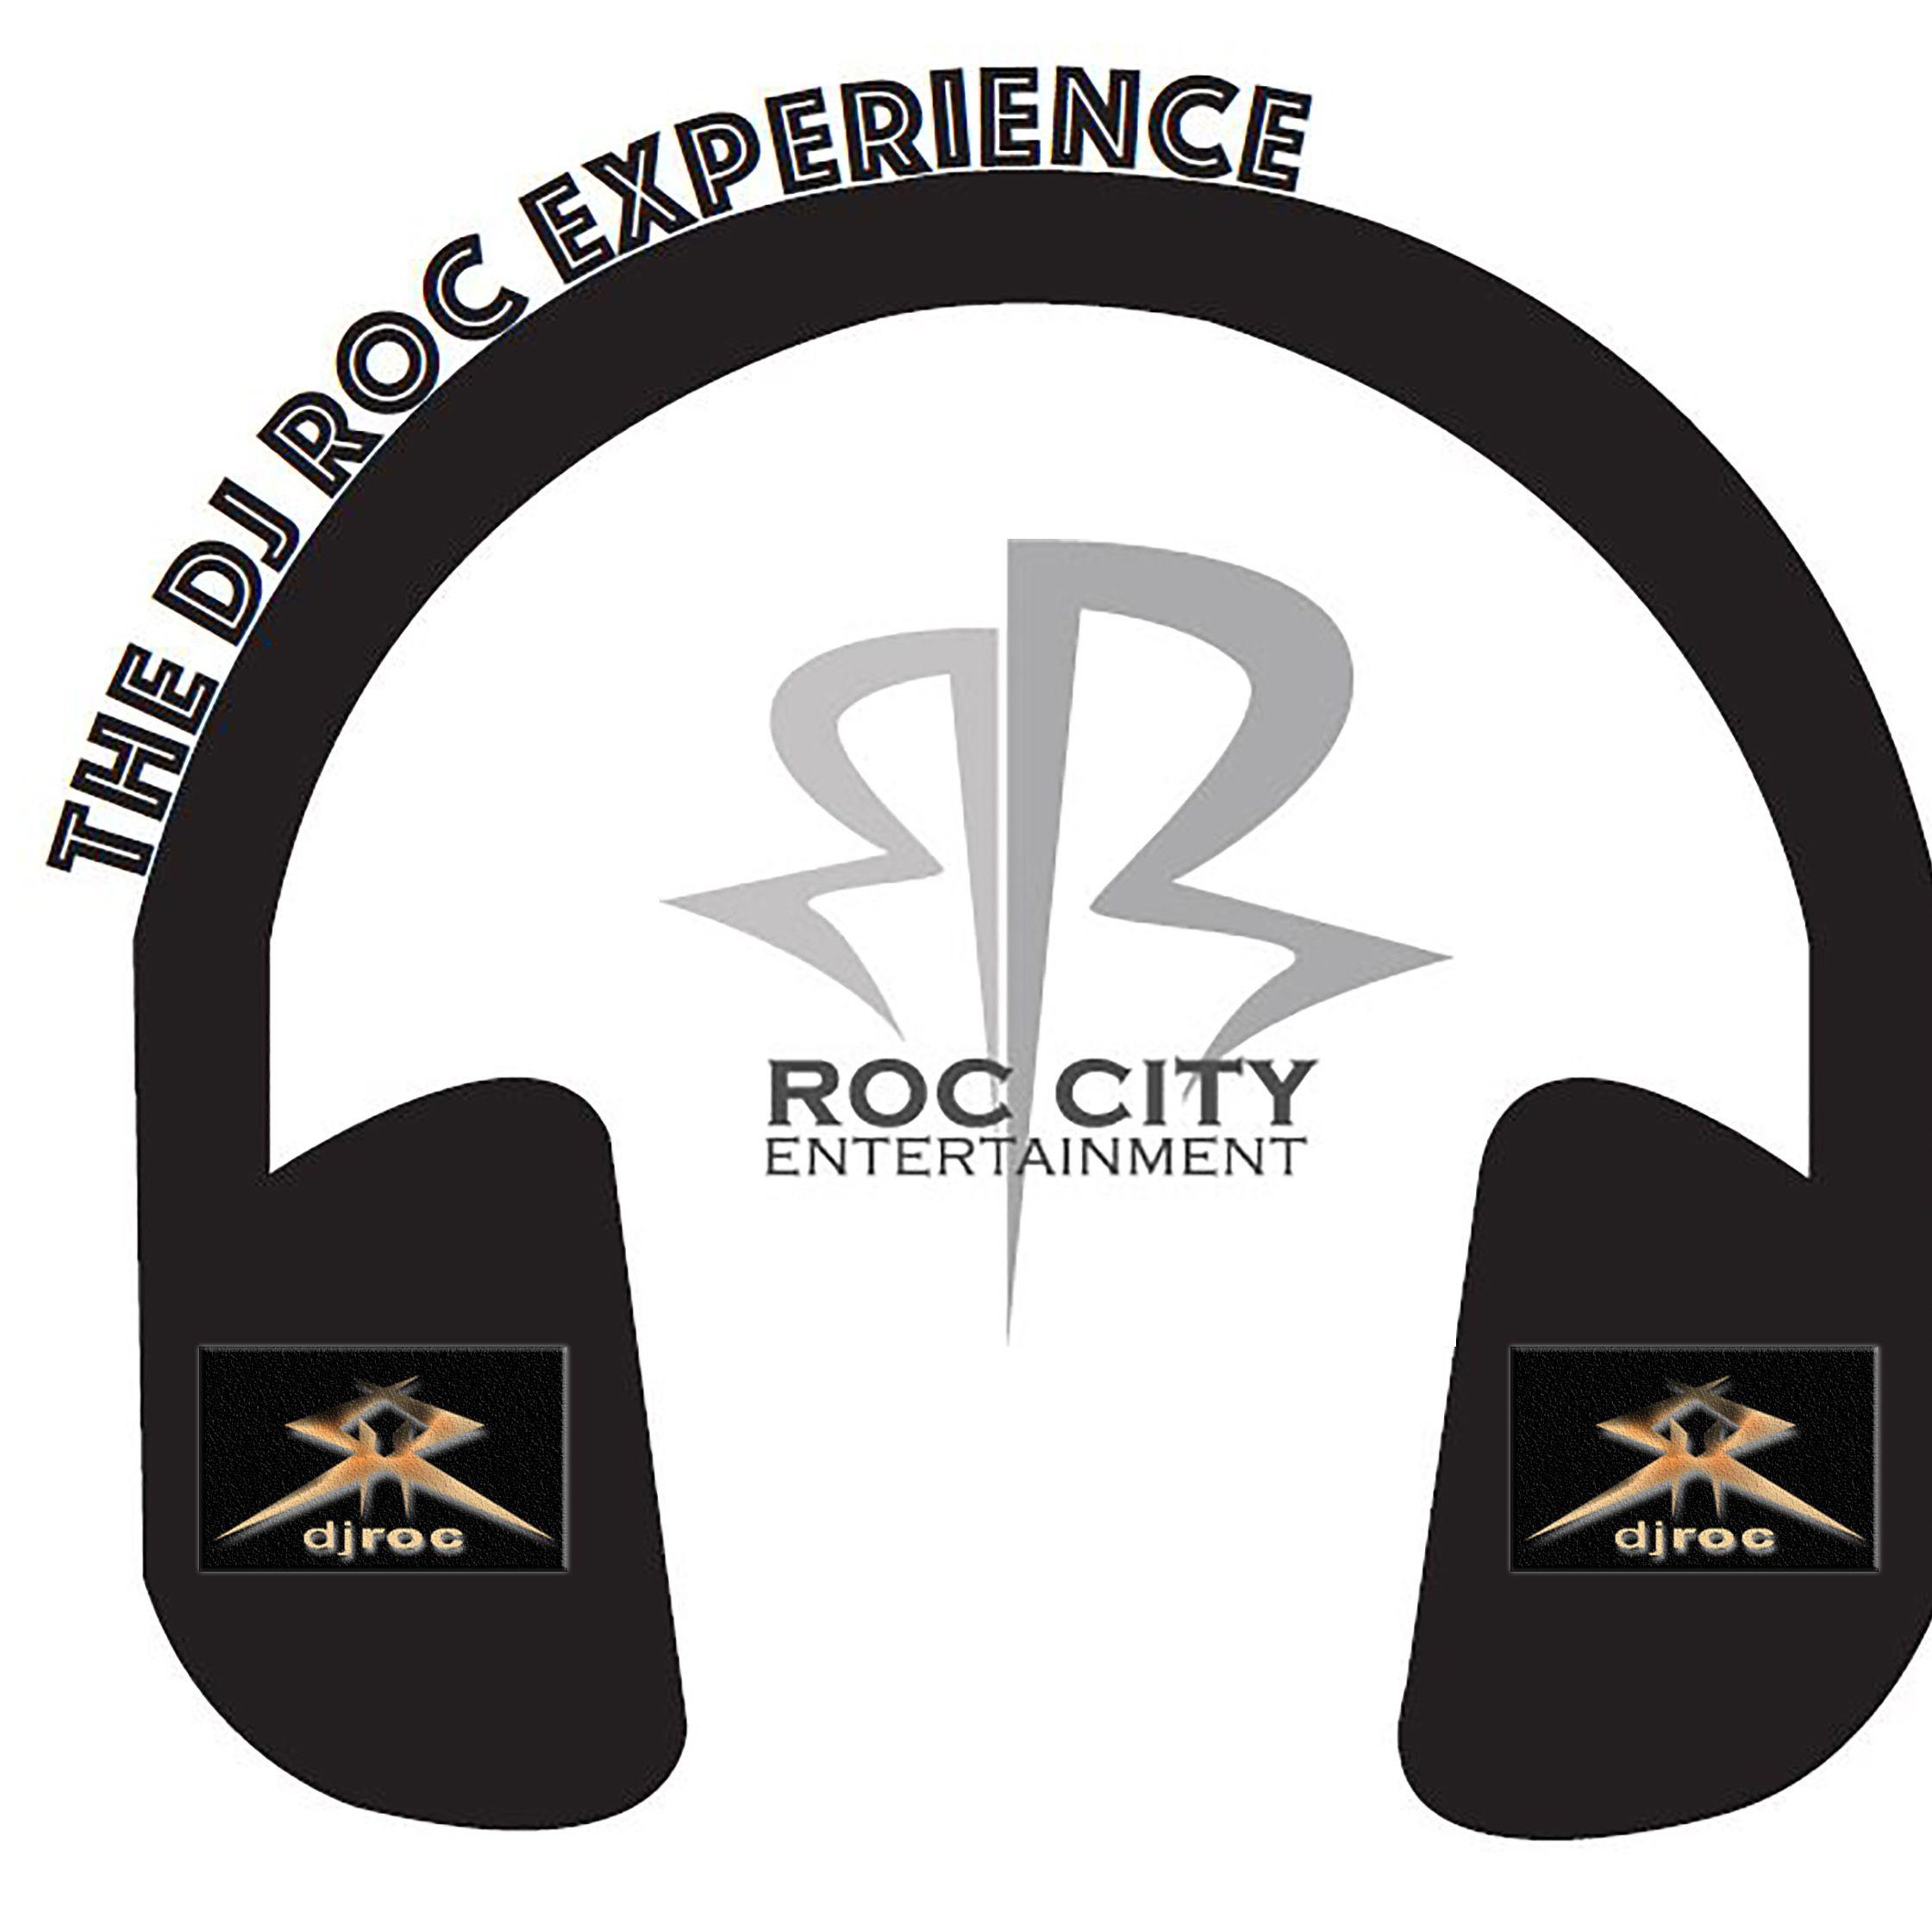 The DJ ROC Experience